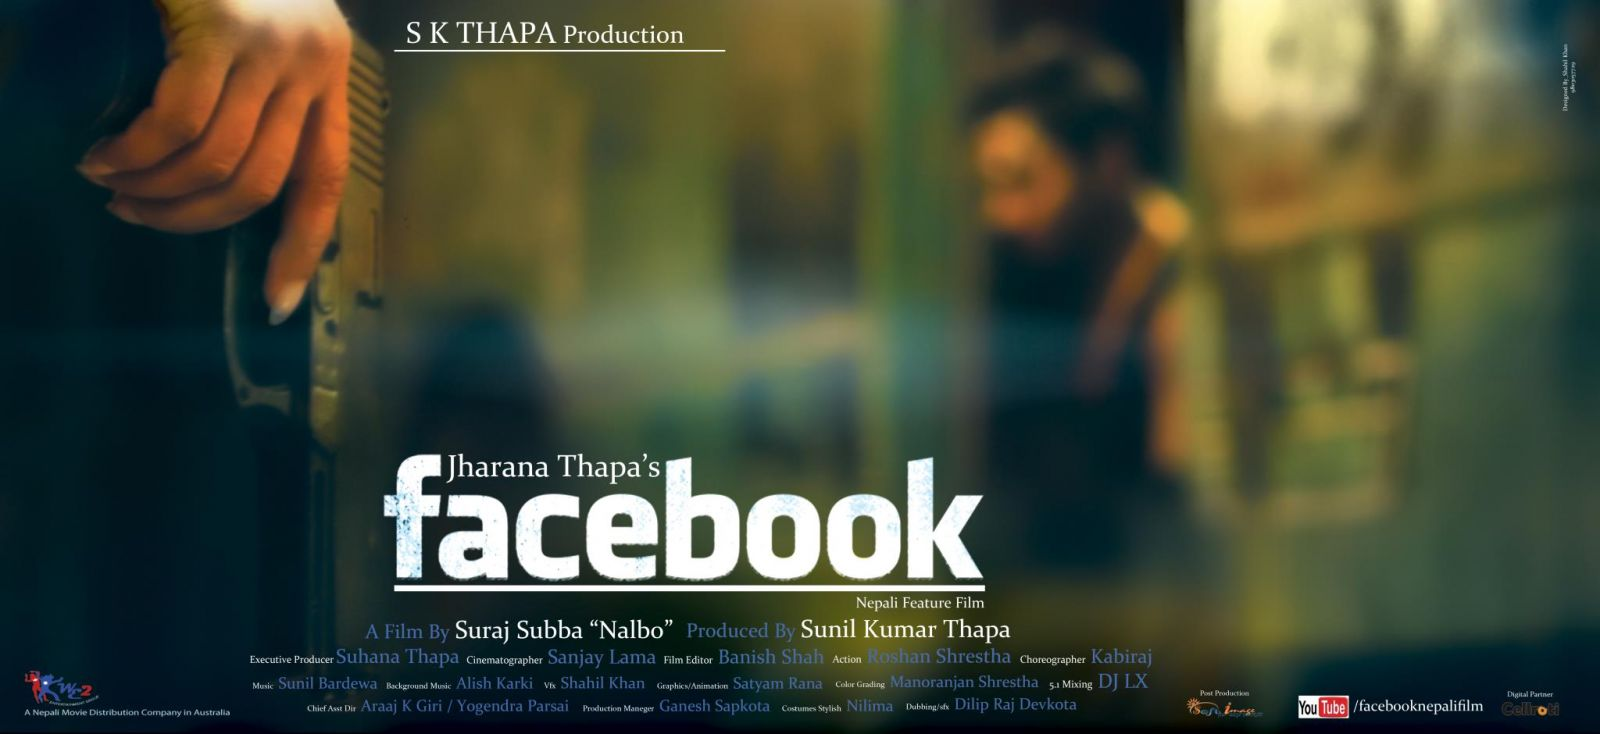 Sano sansar 2017 nepali movie online : battcuddto